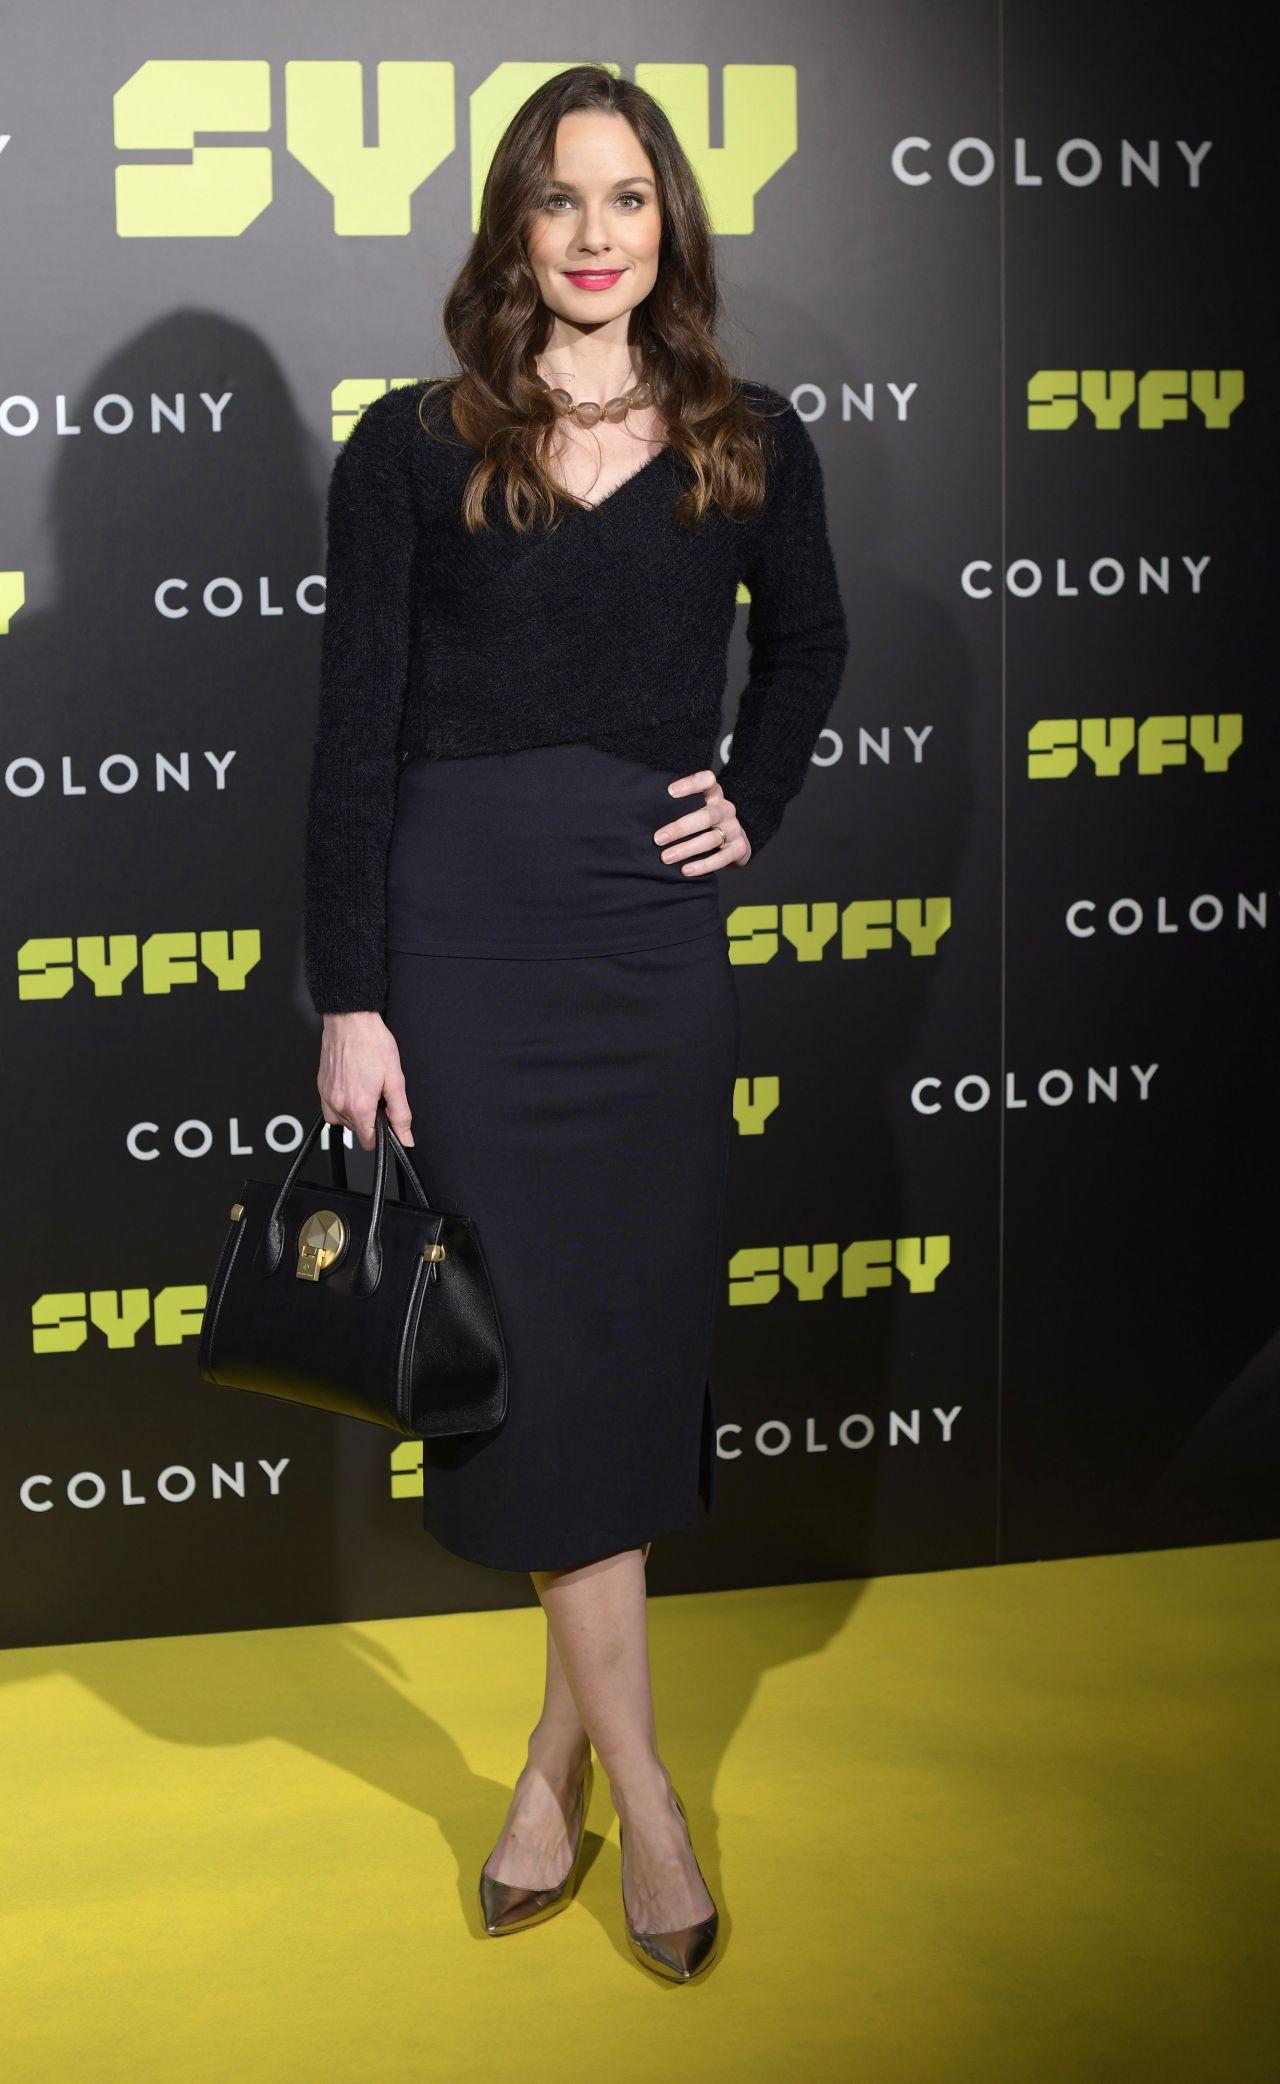 http://celebmafia.com/wp-content/uploads/2018/03/sarah-wayne-callies-colony-photocall-in-madrid-12.jpg